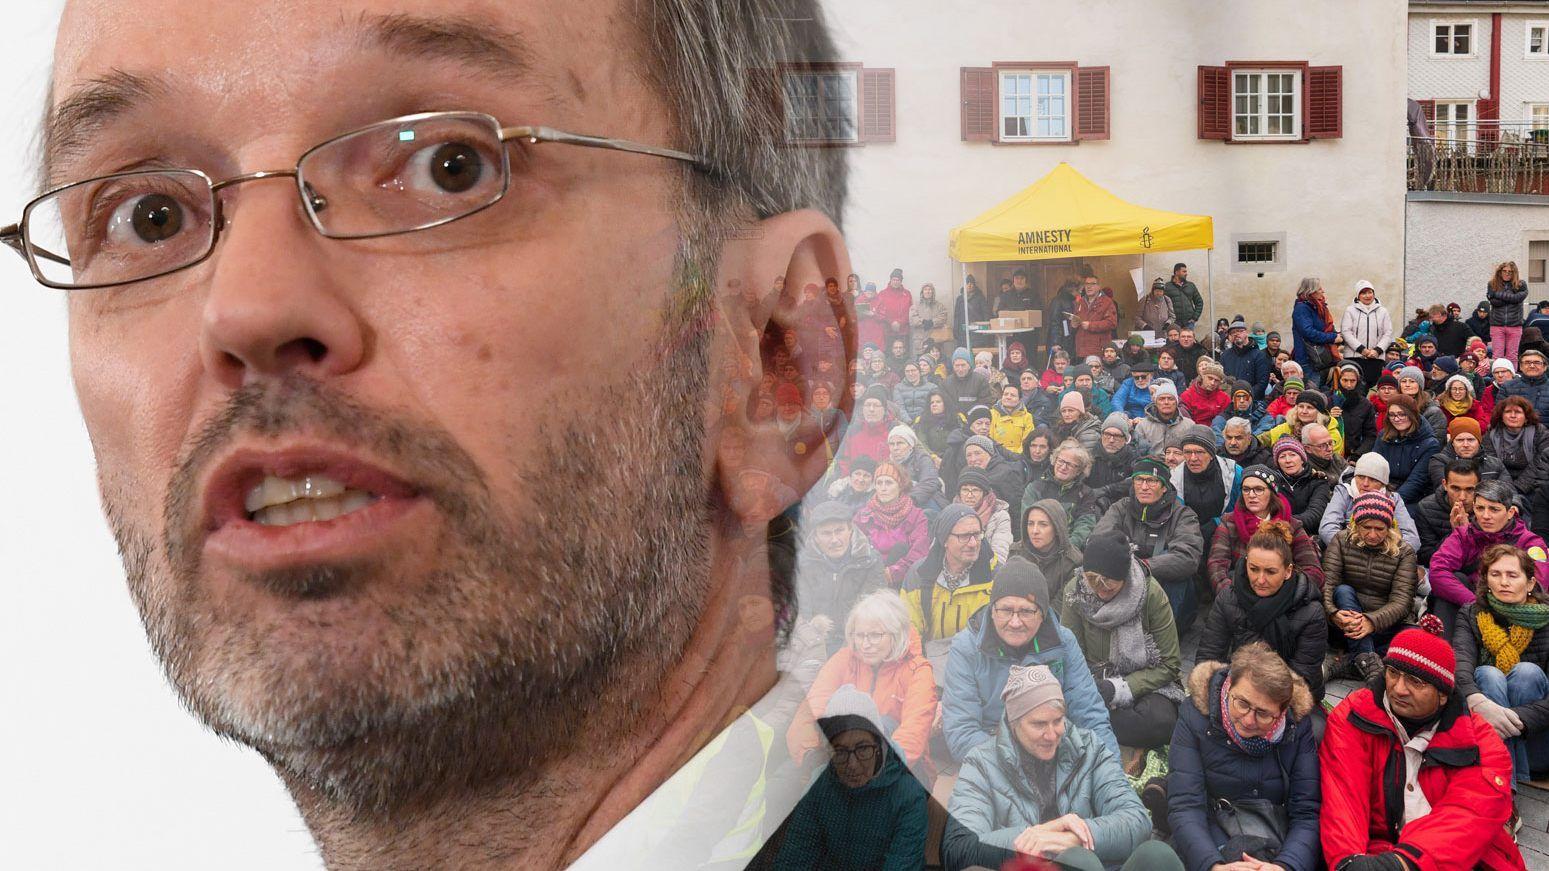 1-50-Euro-Lohnobergrenze-f-r-Asylwerber-Kritik-bei-Sonntagsdemo-in-Hohenems